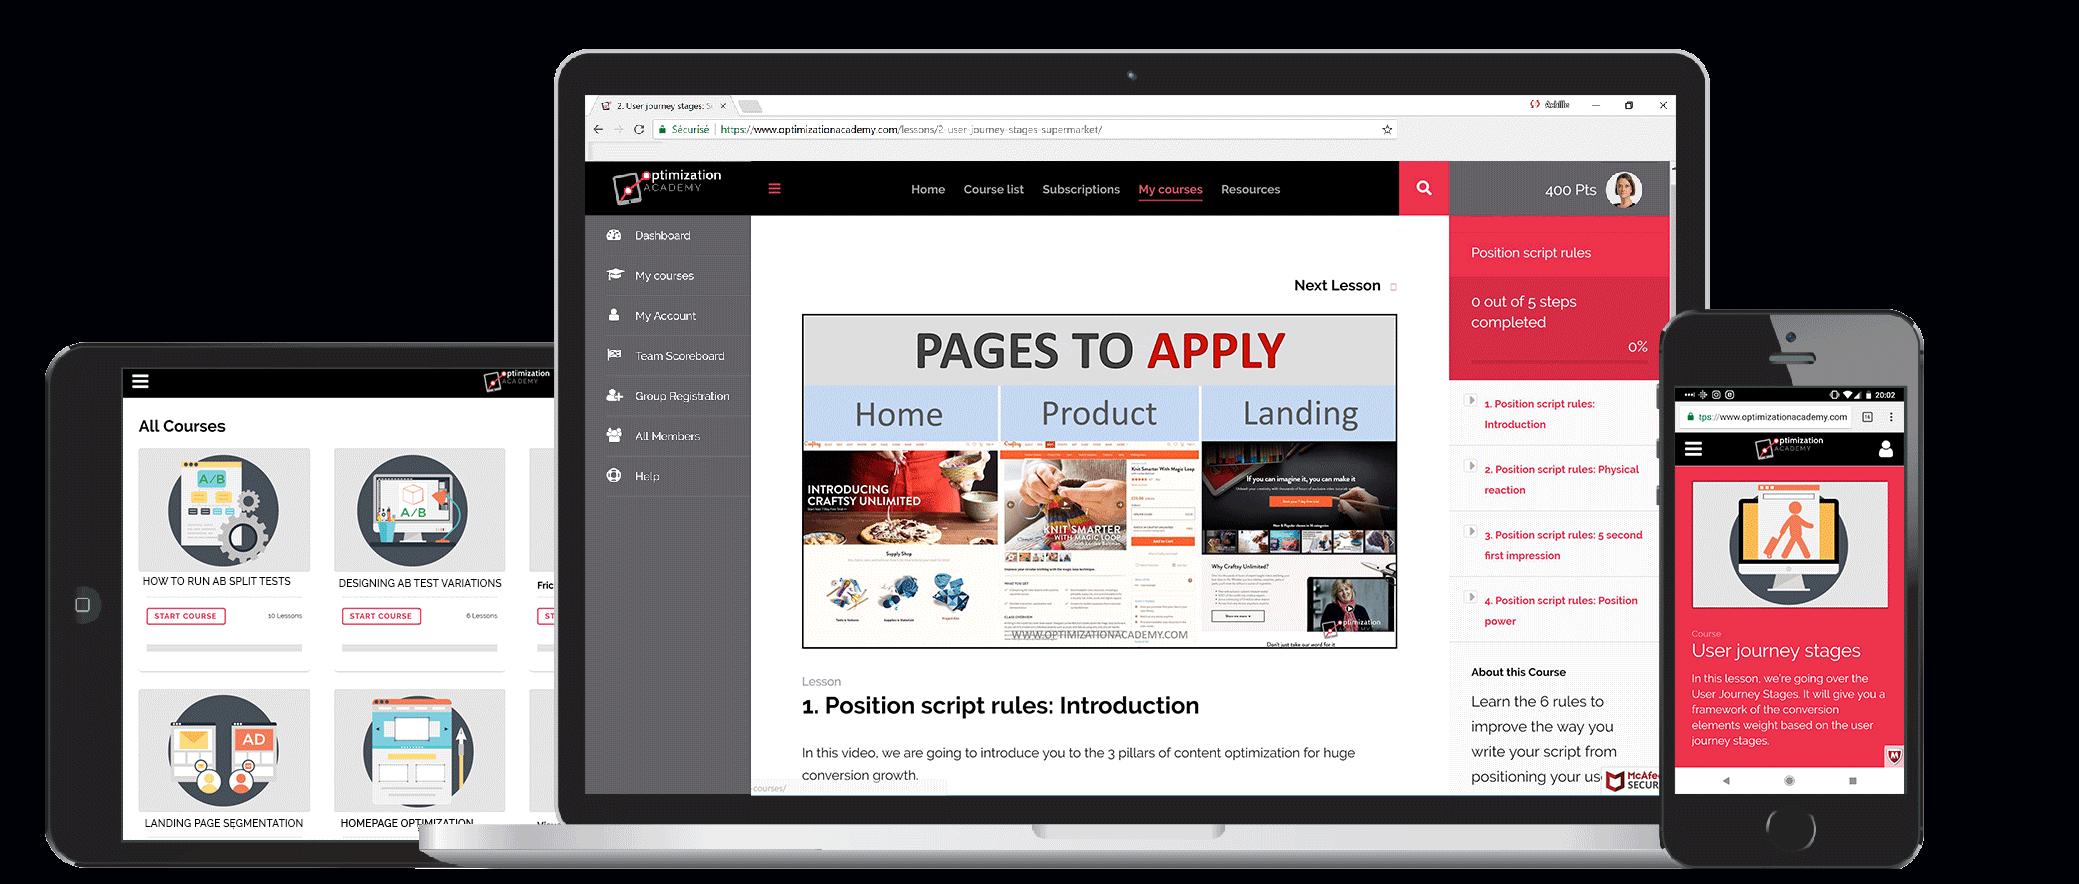 Preview_desktop-tablet-mobile-600x255